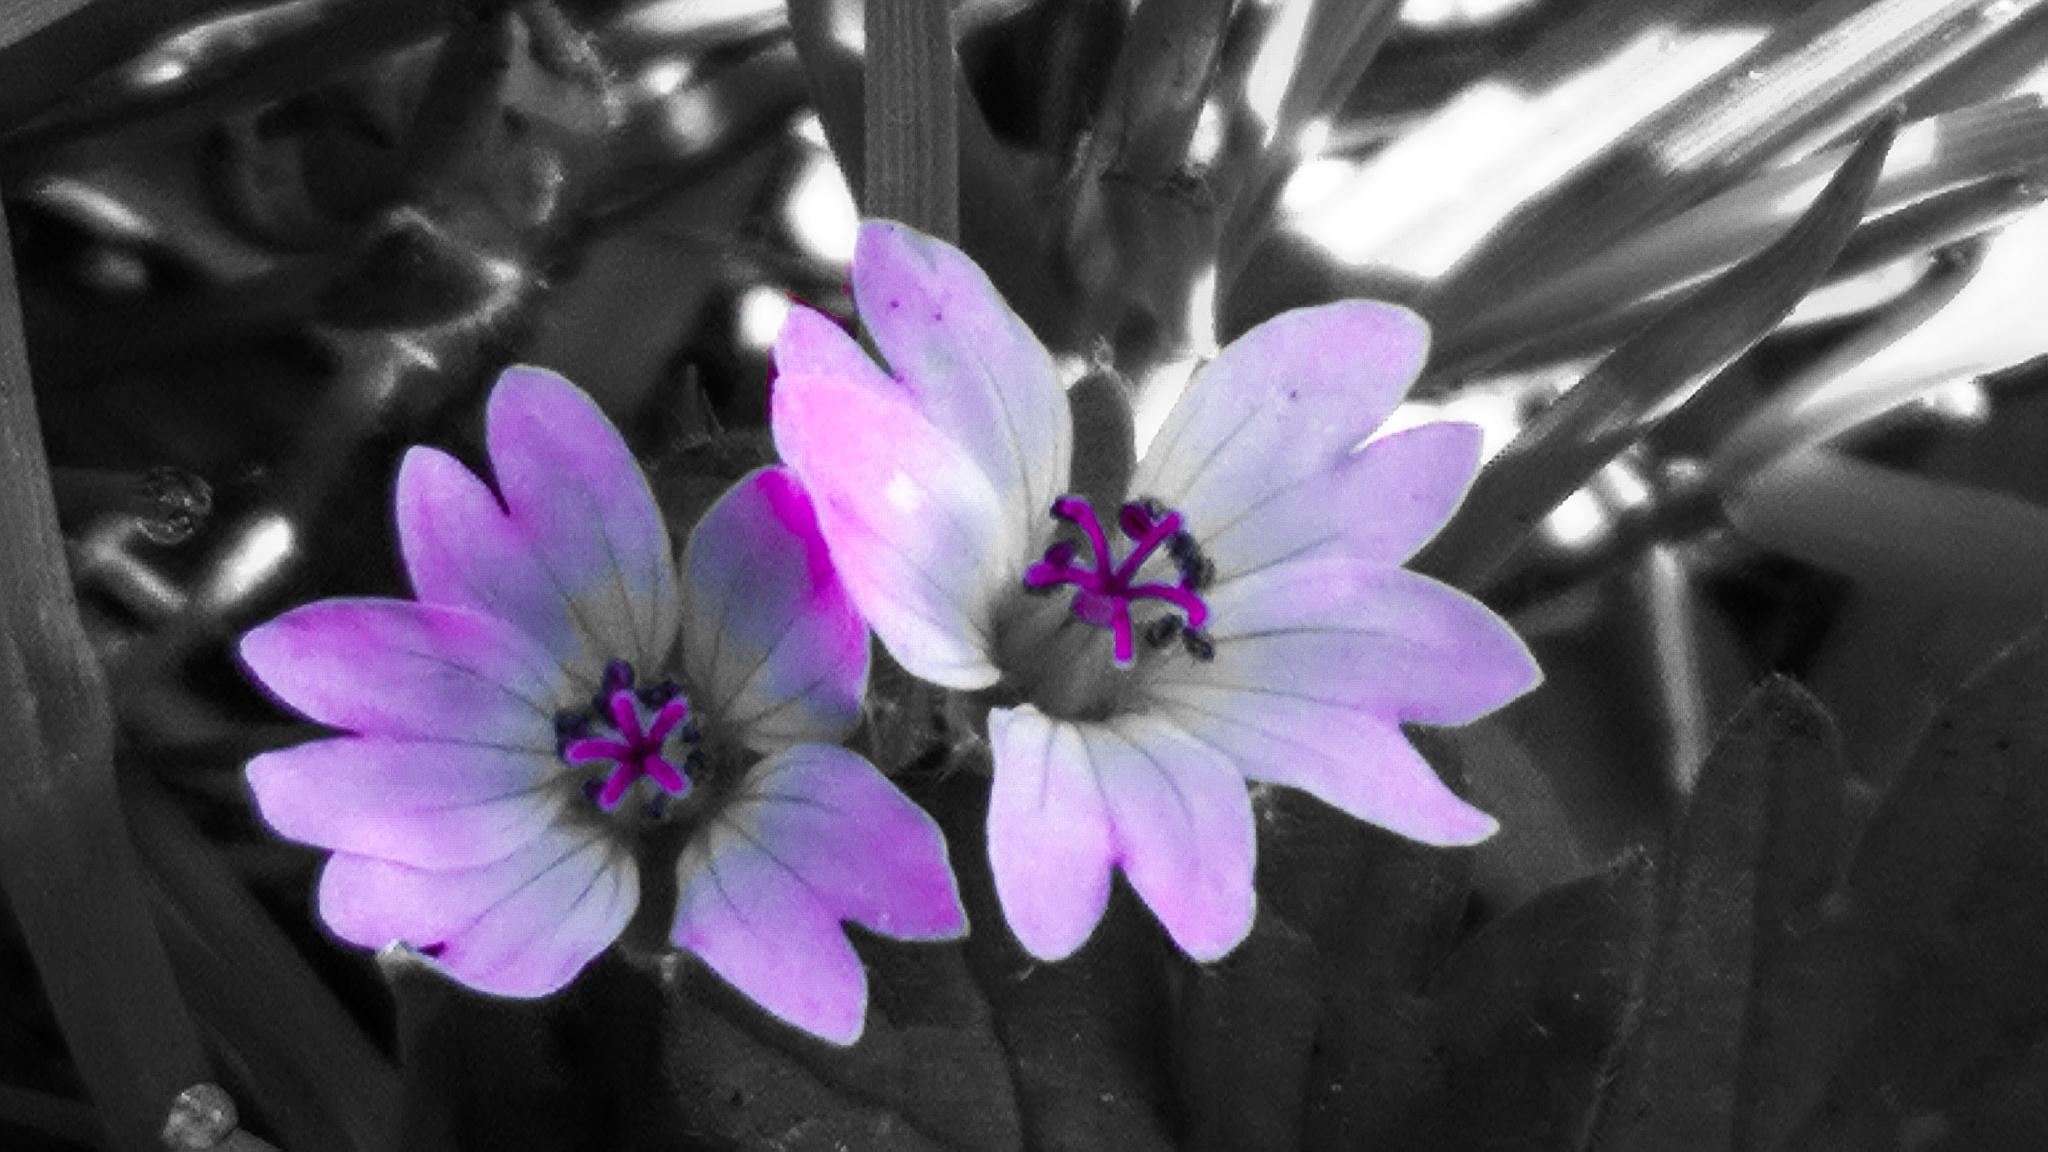 Purple Flowers by gemma smith